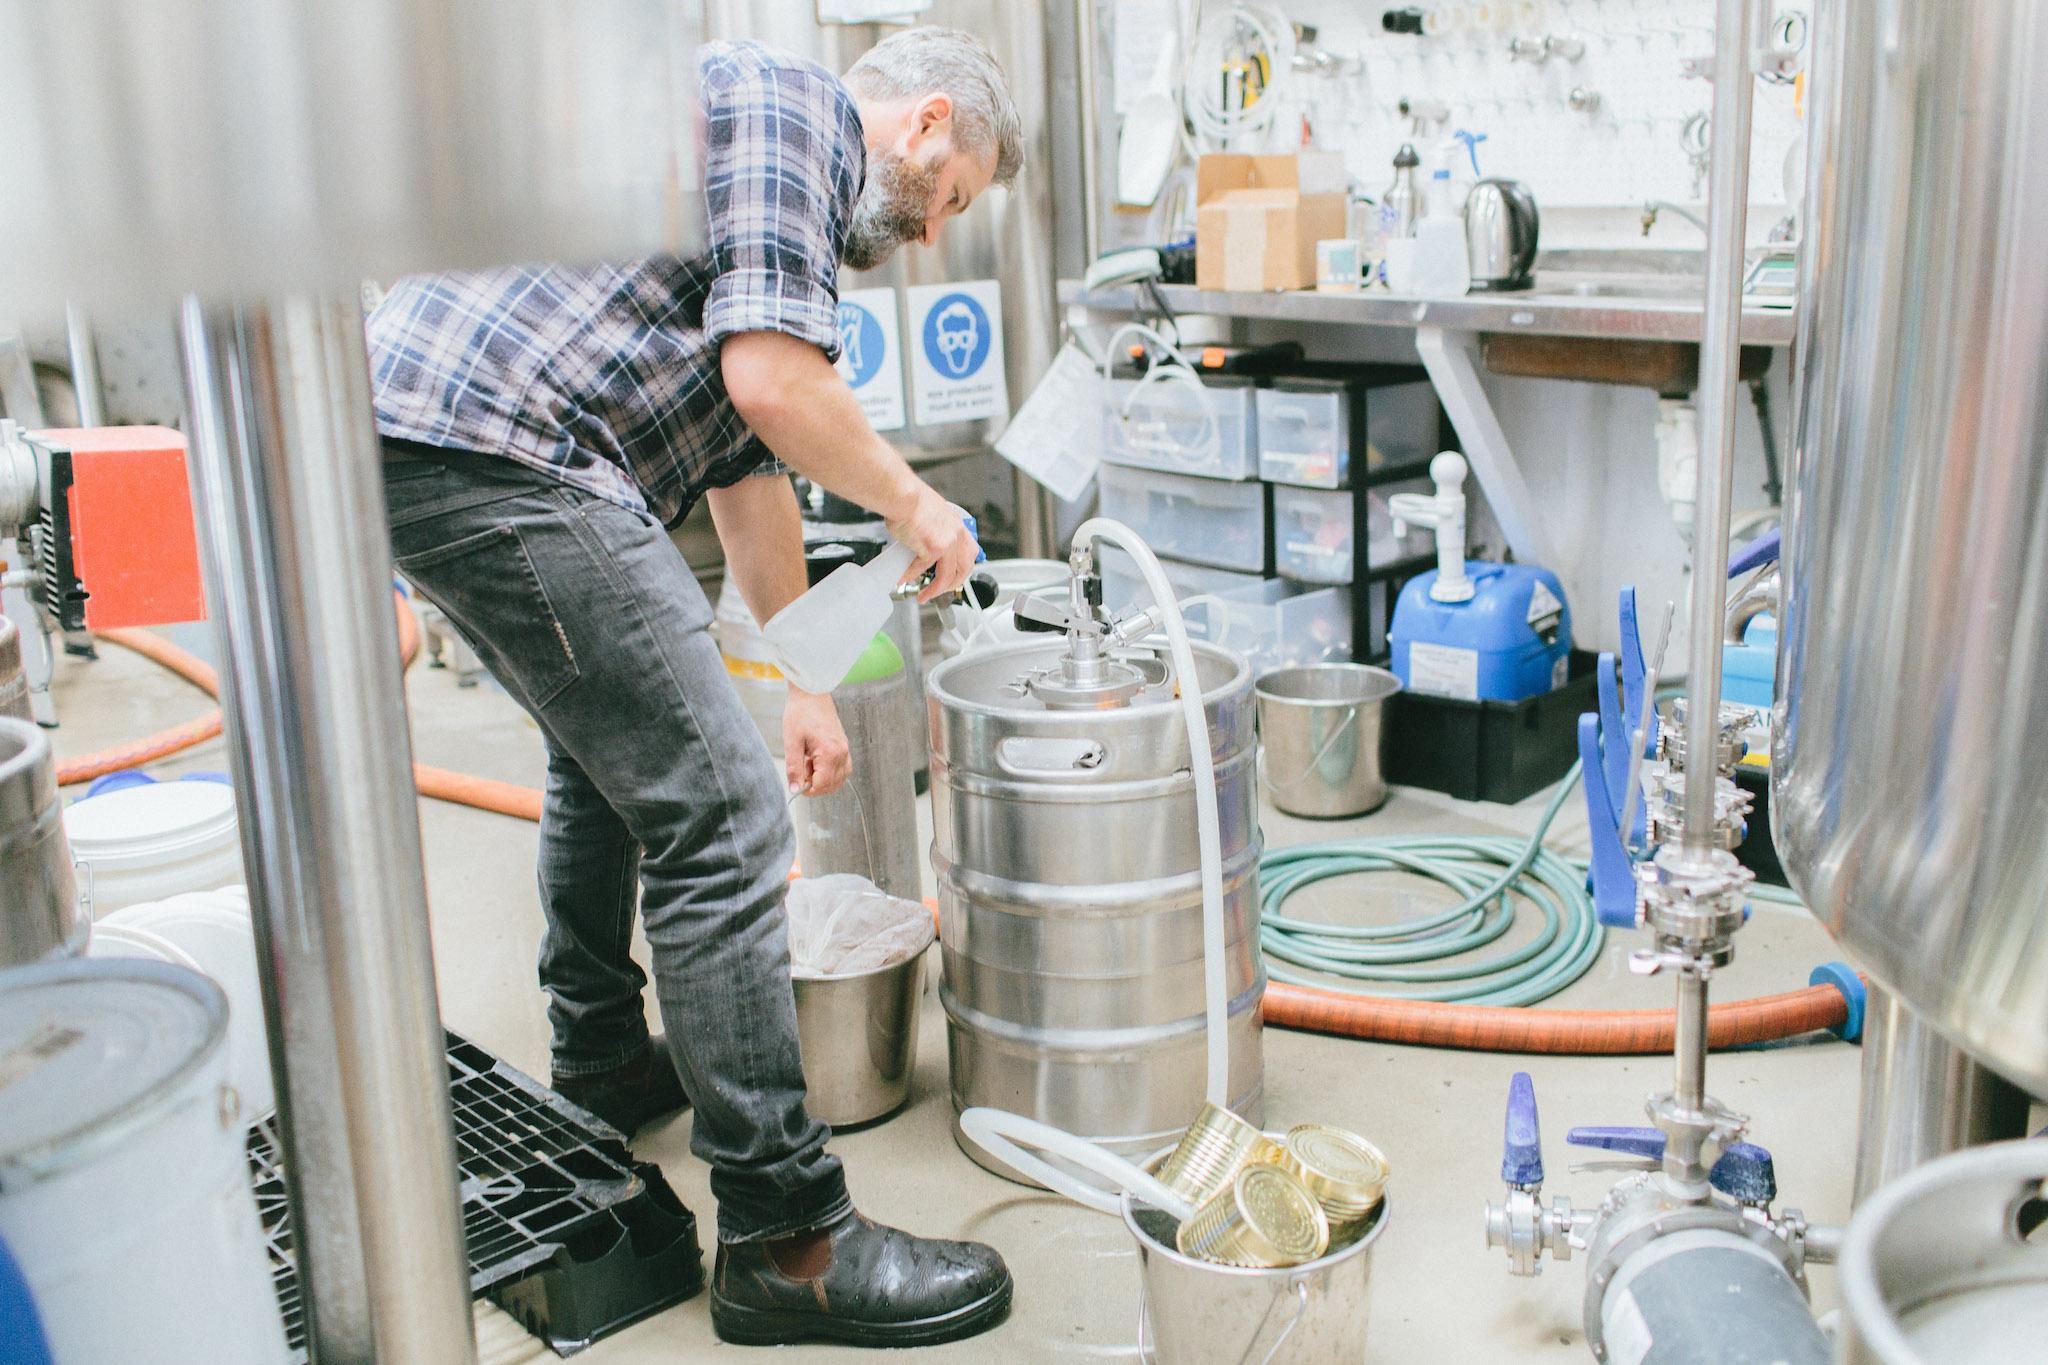 Garage Project 2015 Beer-2.jpeg